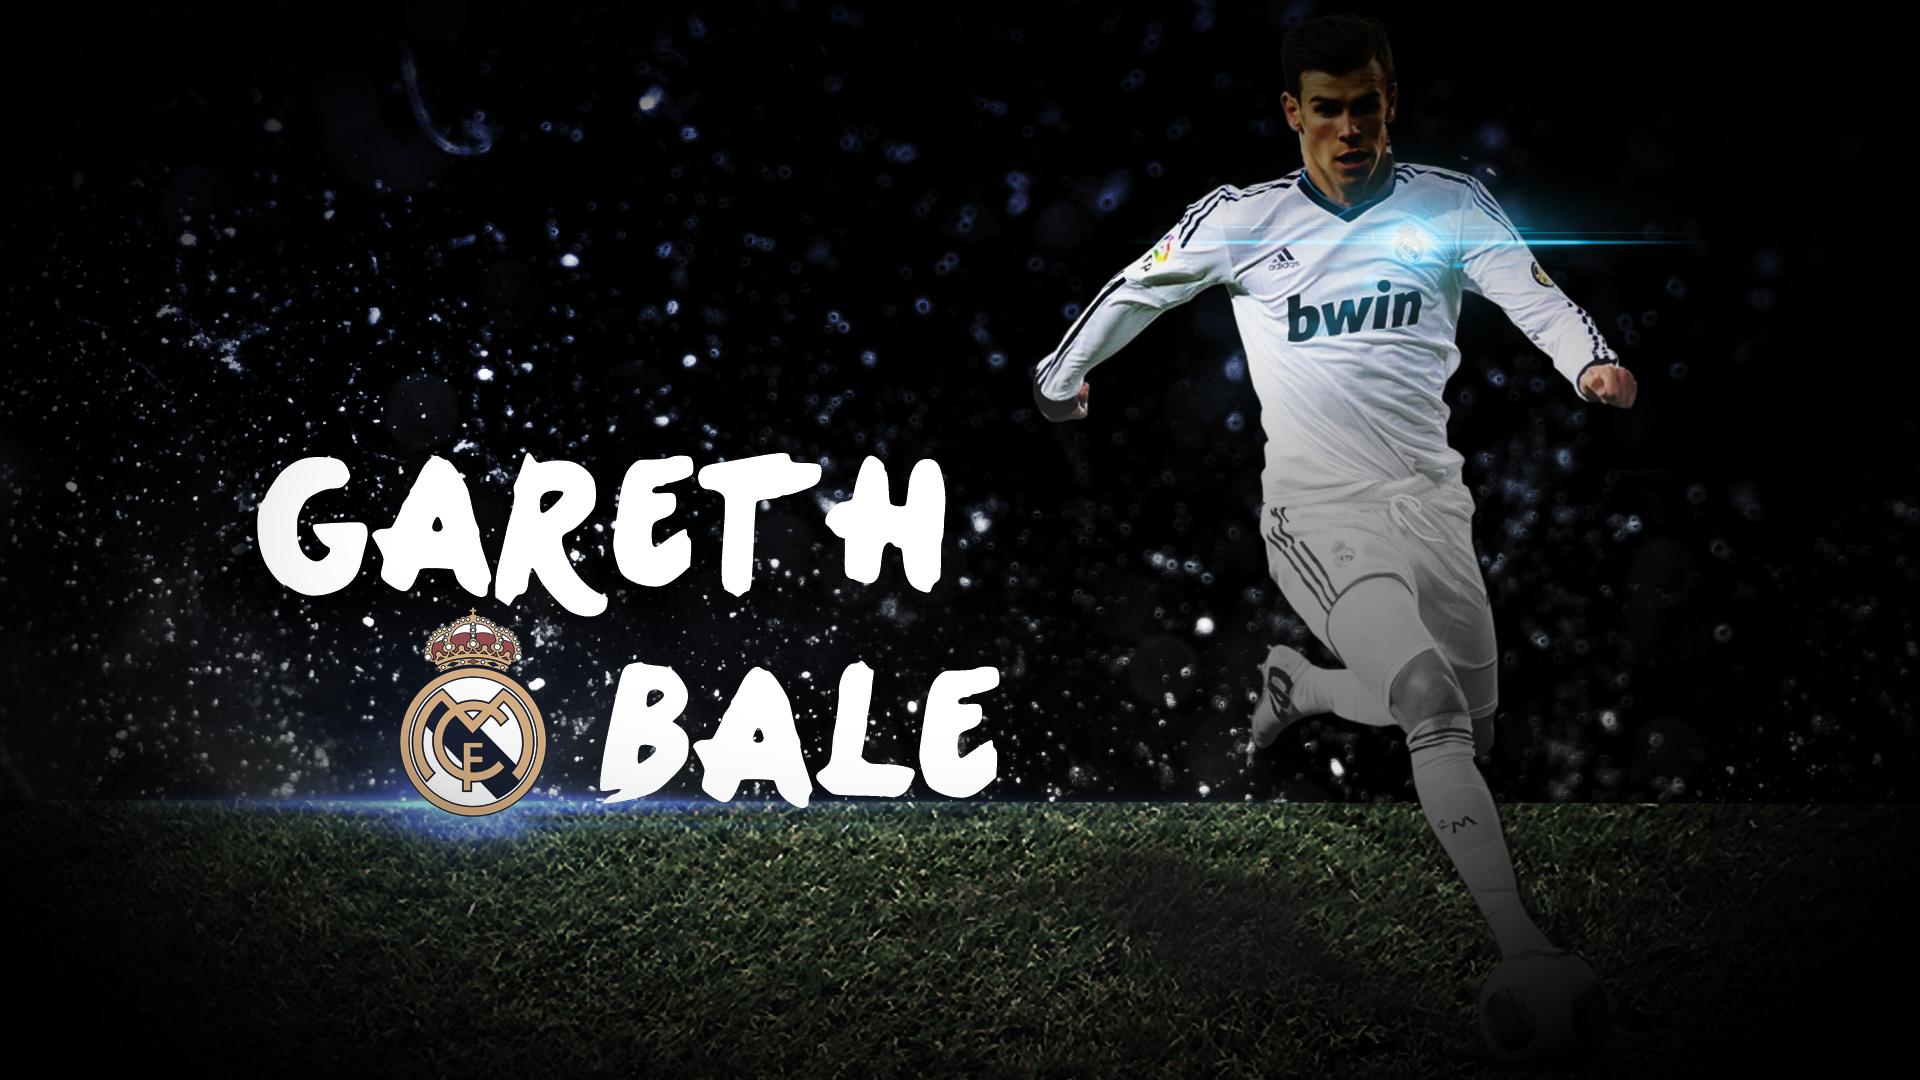 Gareth Bale Wallpaper HD